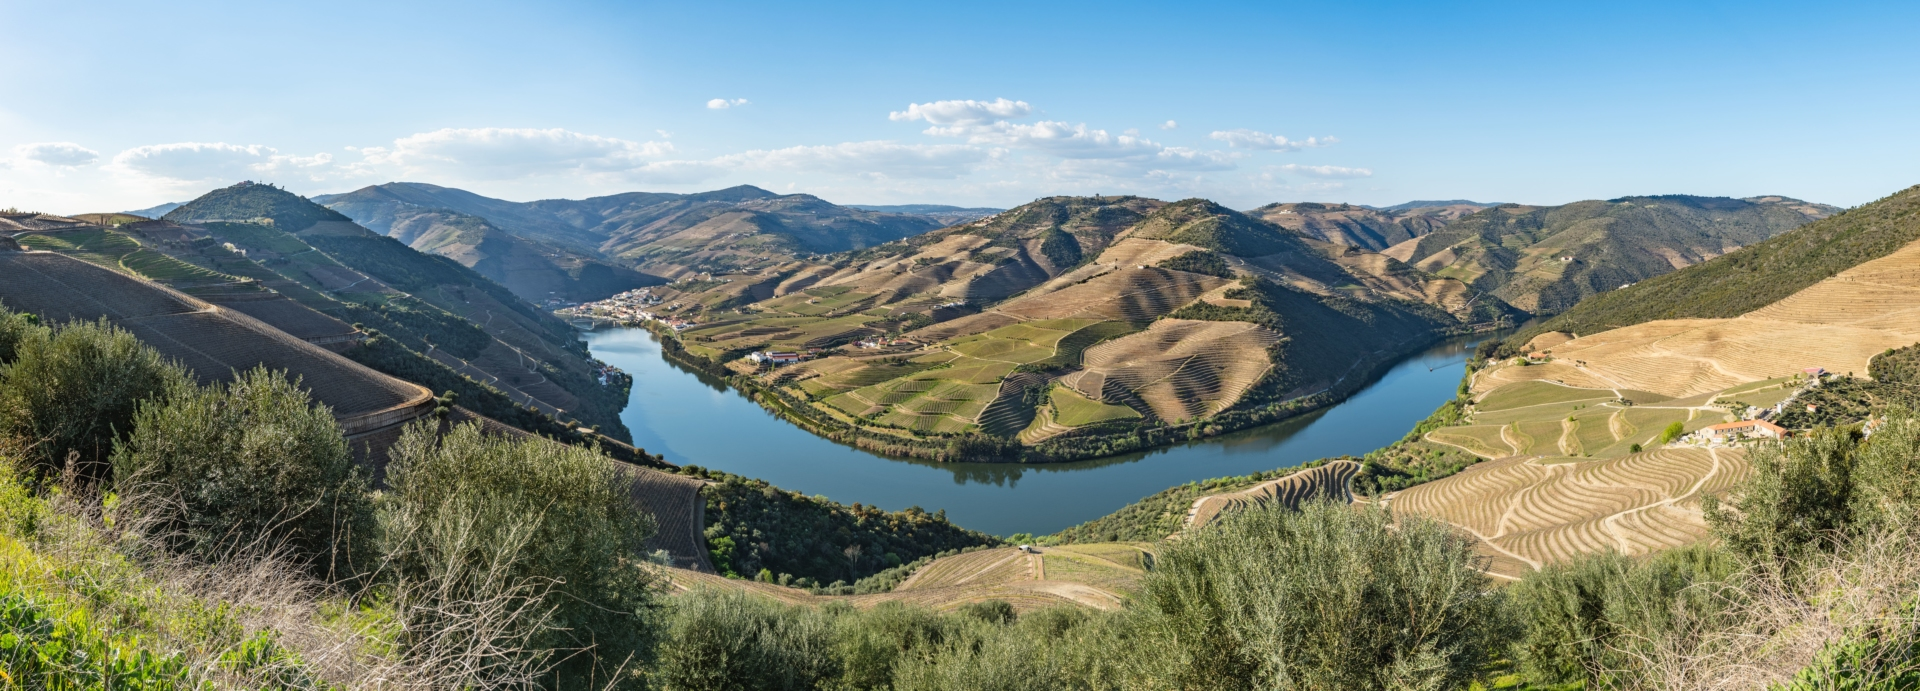 Panorama verdoyant de la vallée du Douro